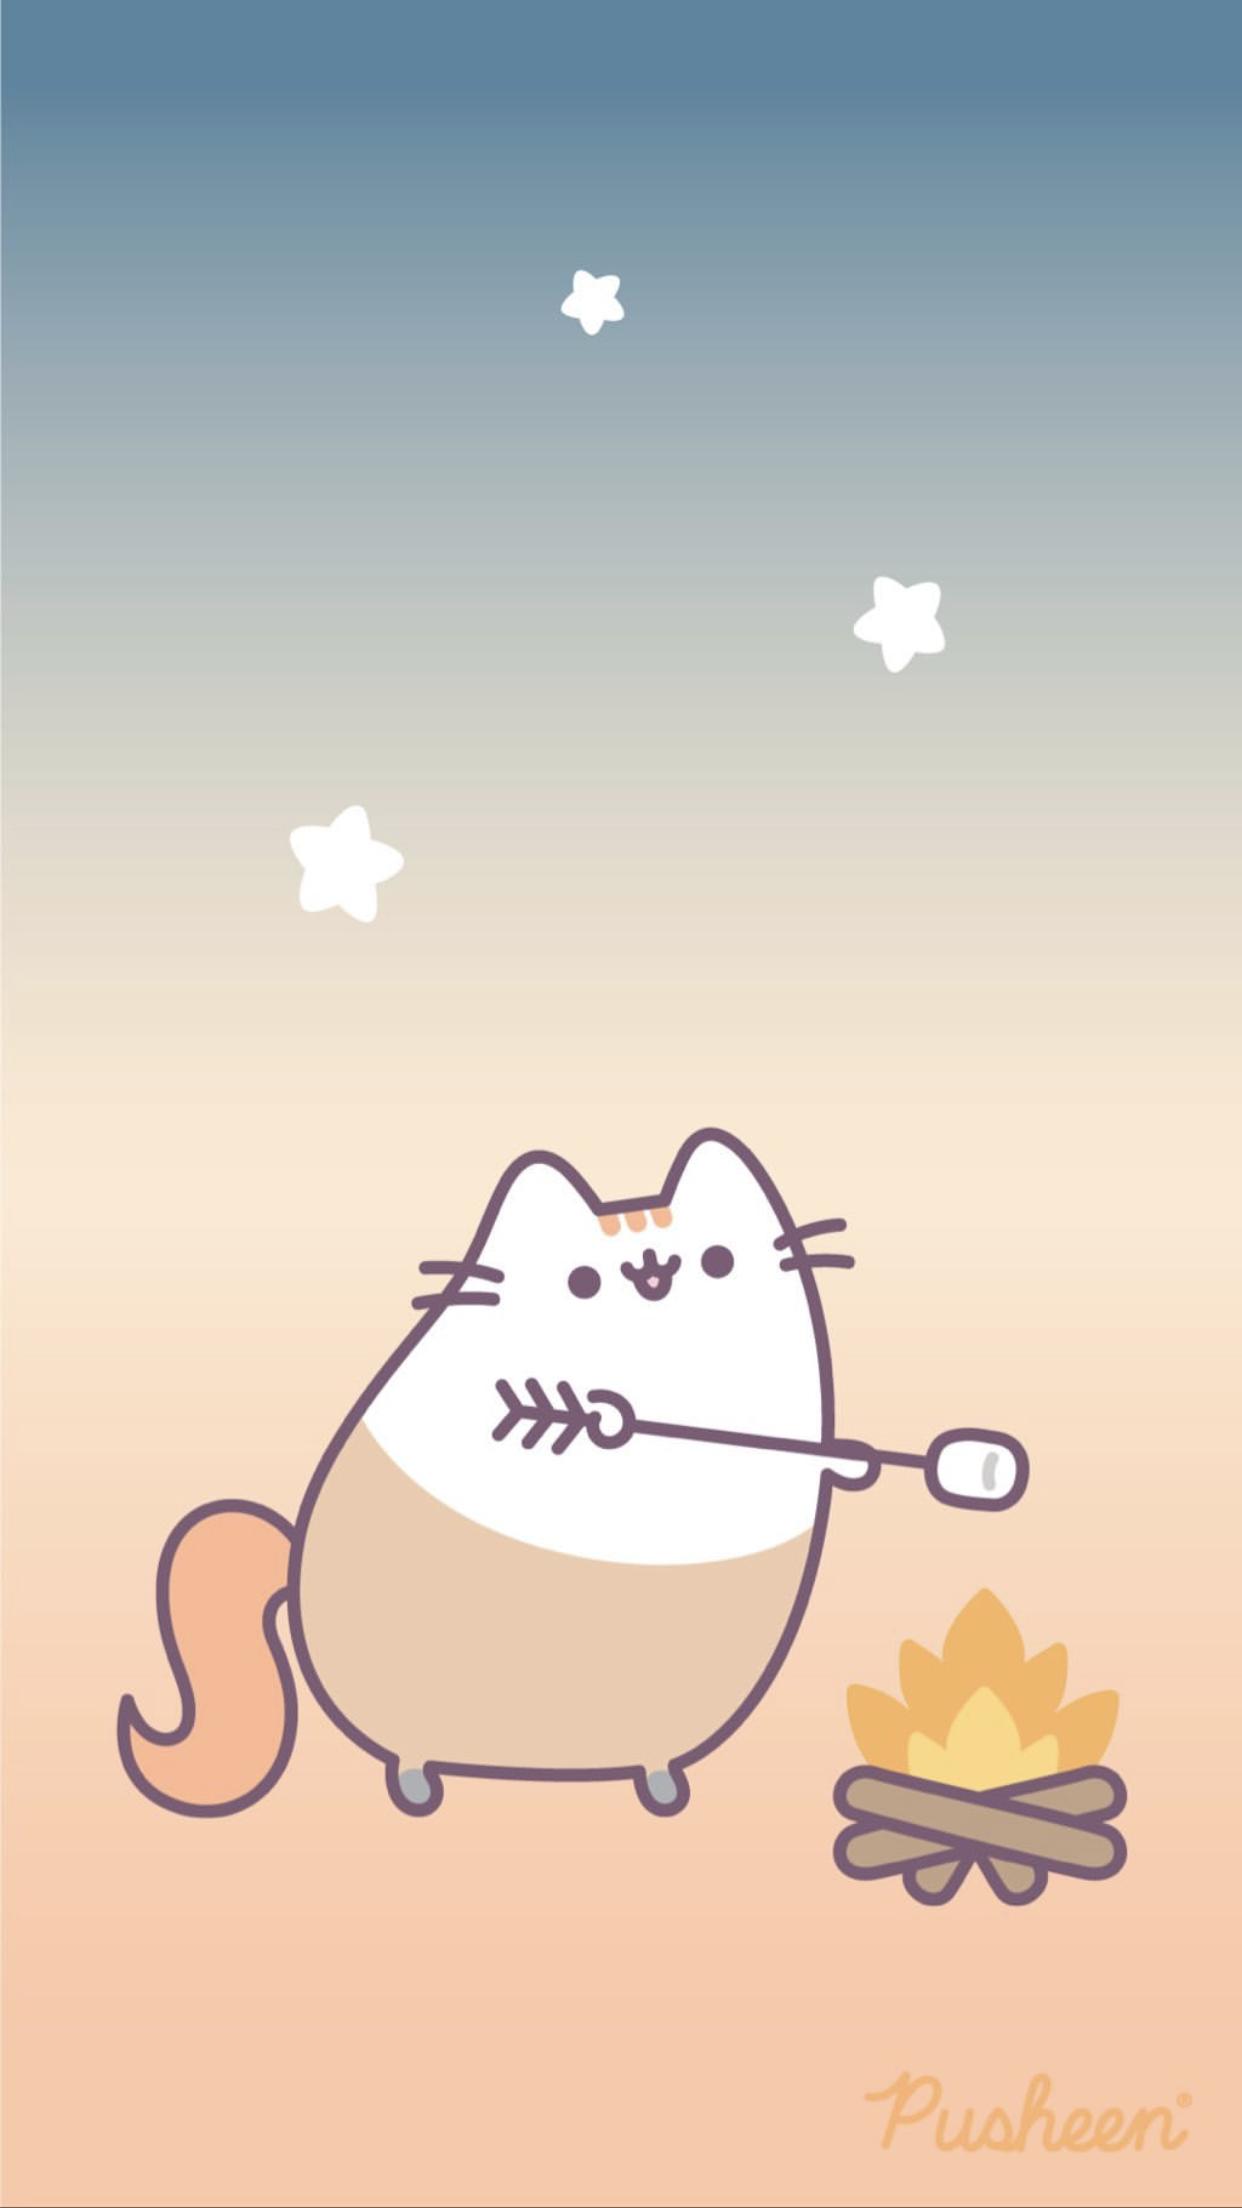 Iphone Wallpaper Pusheen Cat Sagittarius Cat Phone Wallpaper Pusheen Cute Iphone Wallpaper Cat